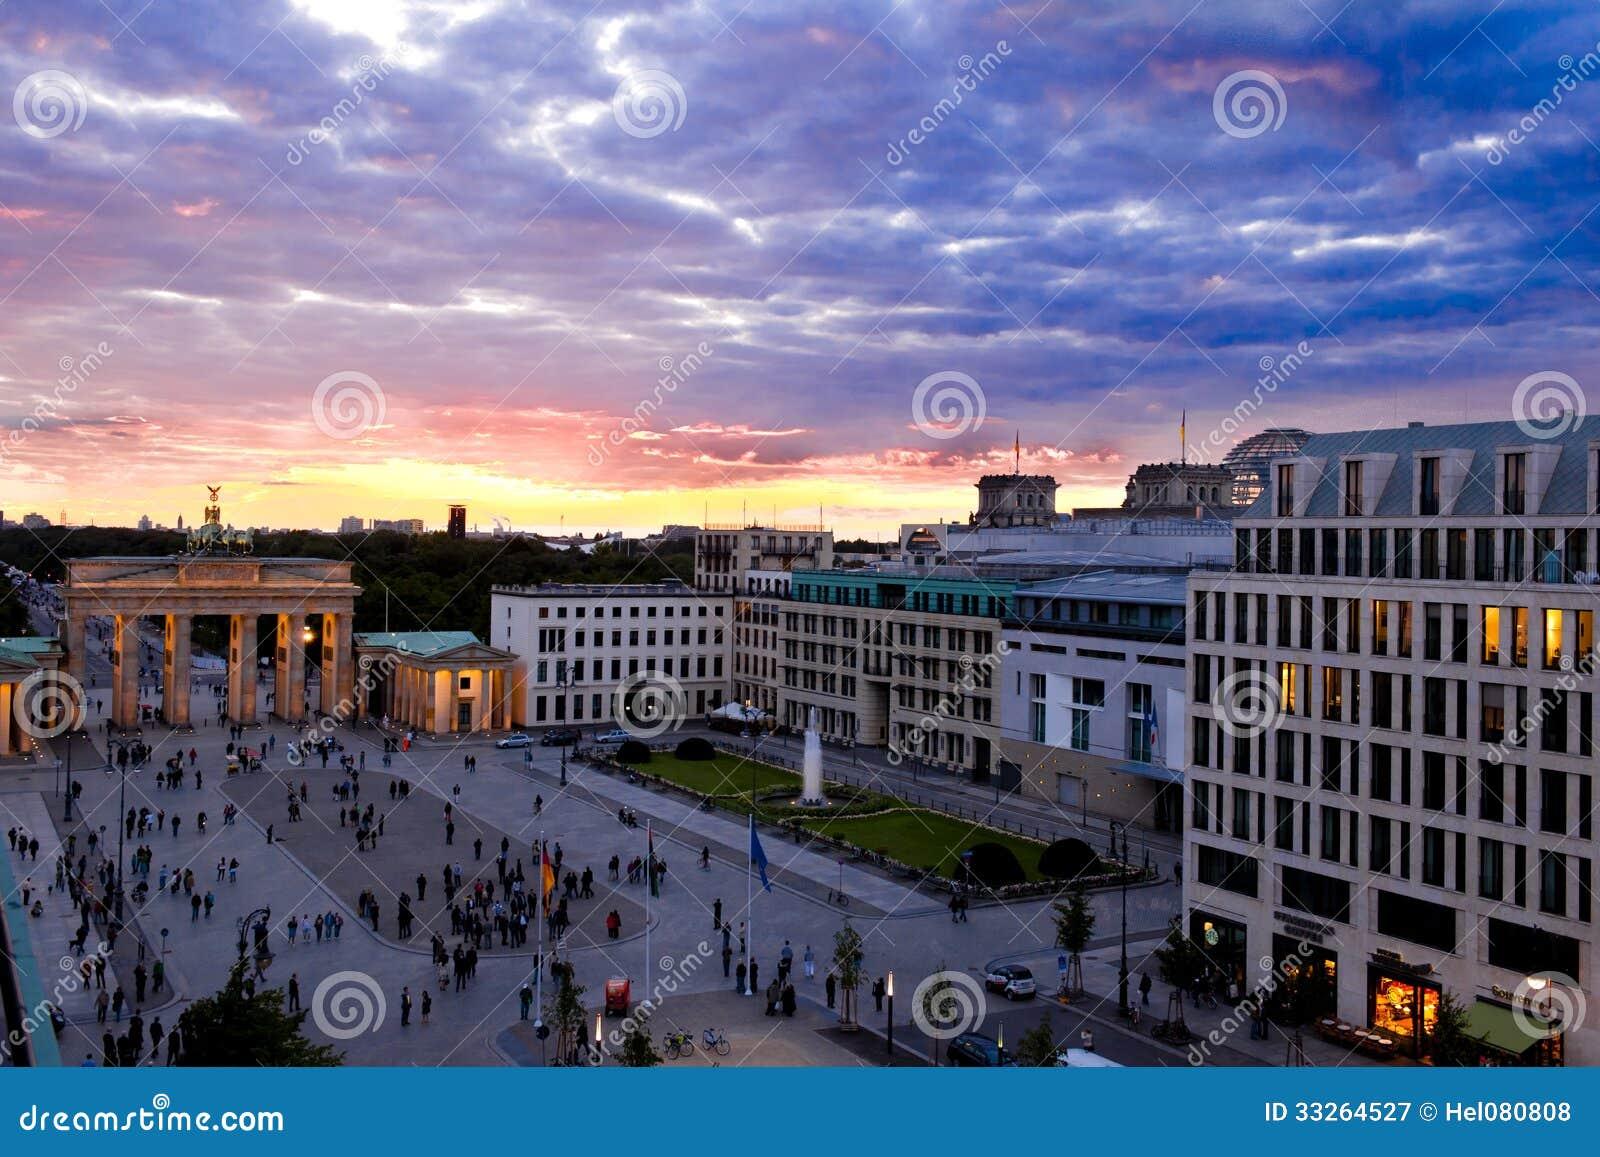 Berlin - Brandenburger Gate at night